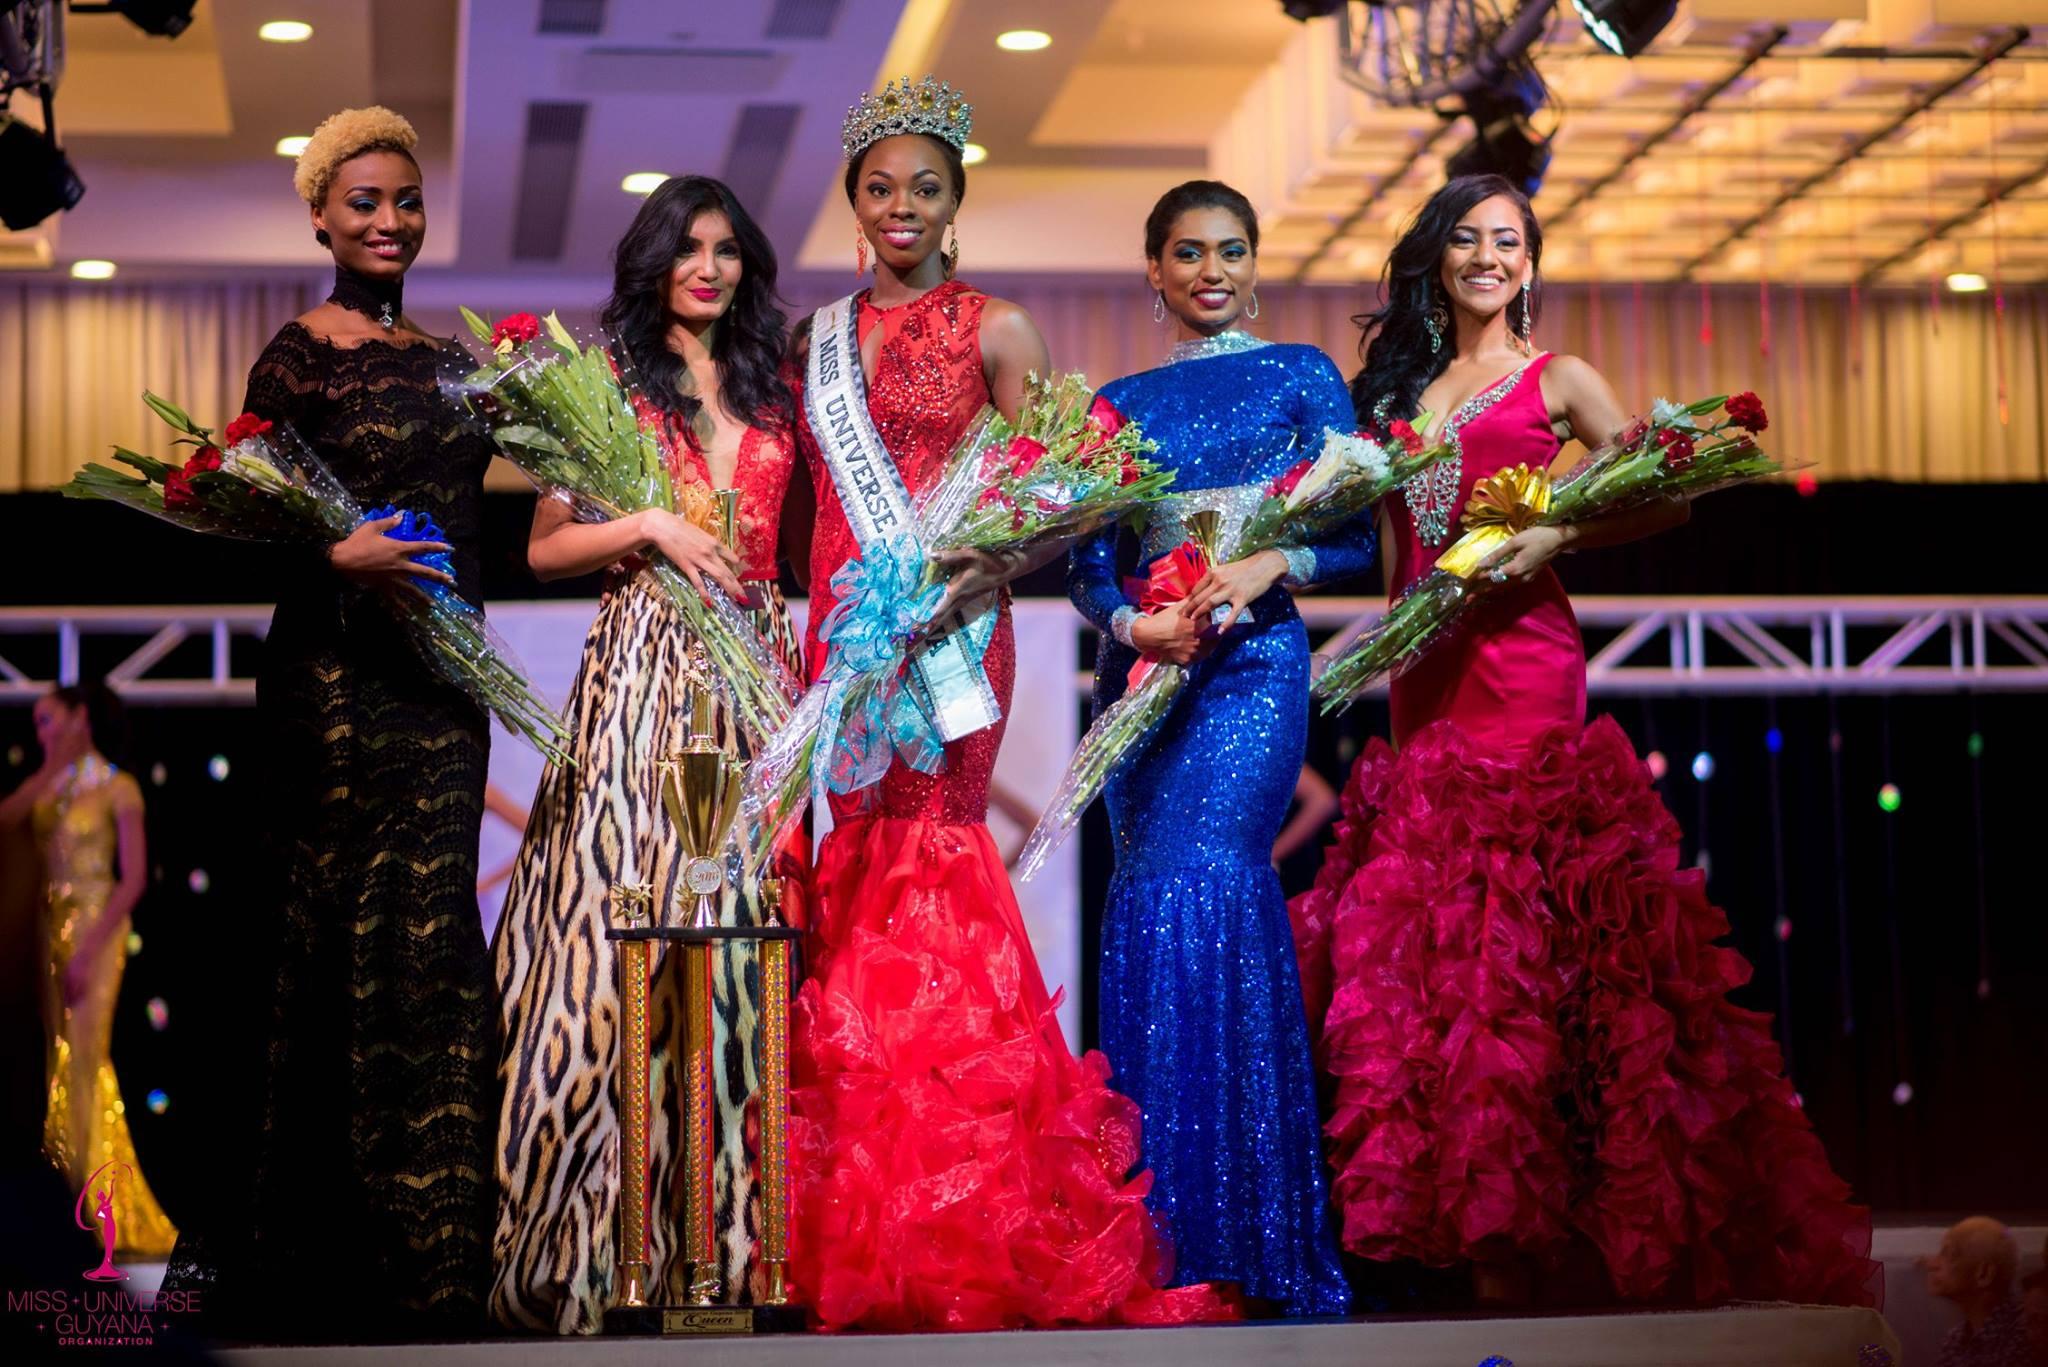 Miss Universe 2016 contestants 8